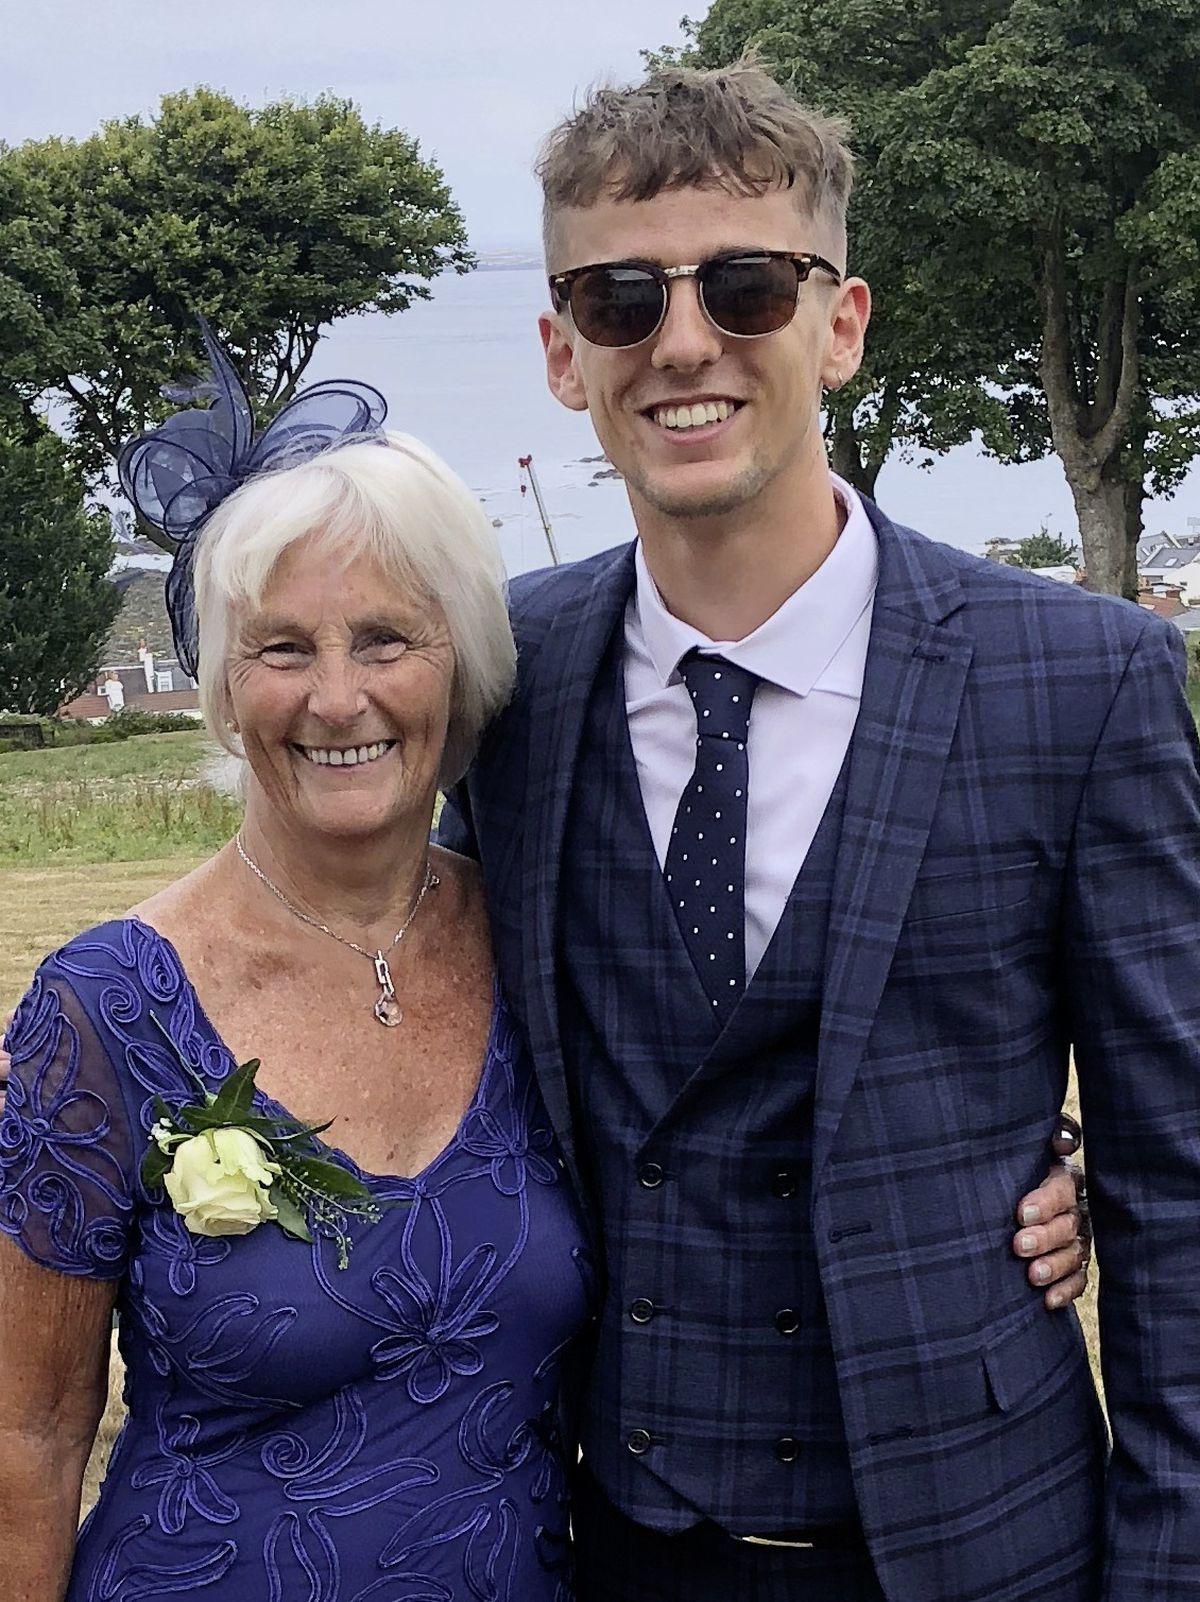 Jacob with his Nan at a family wedding. (28644759)